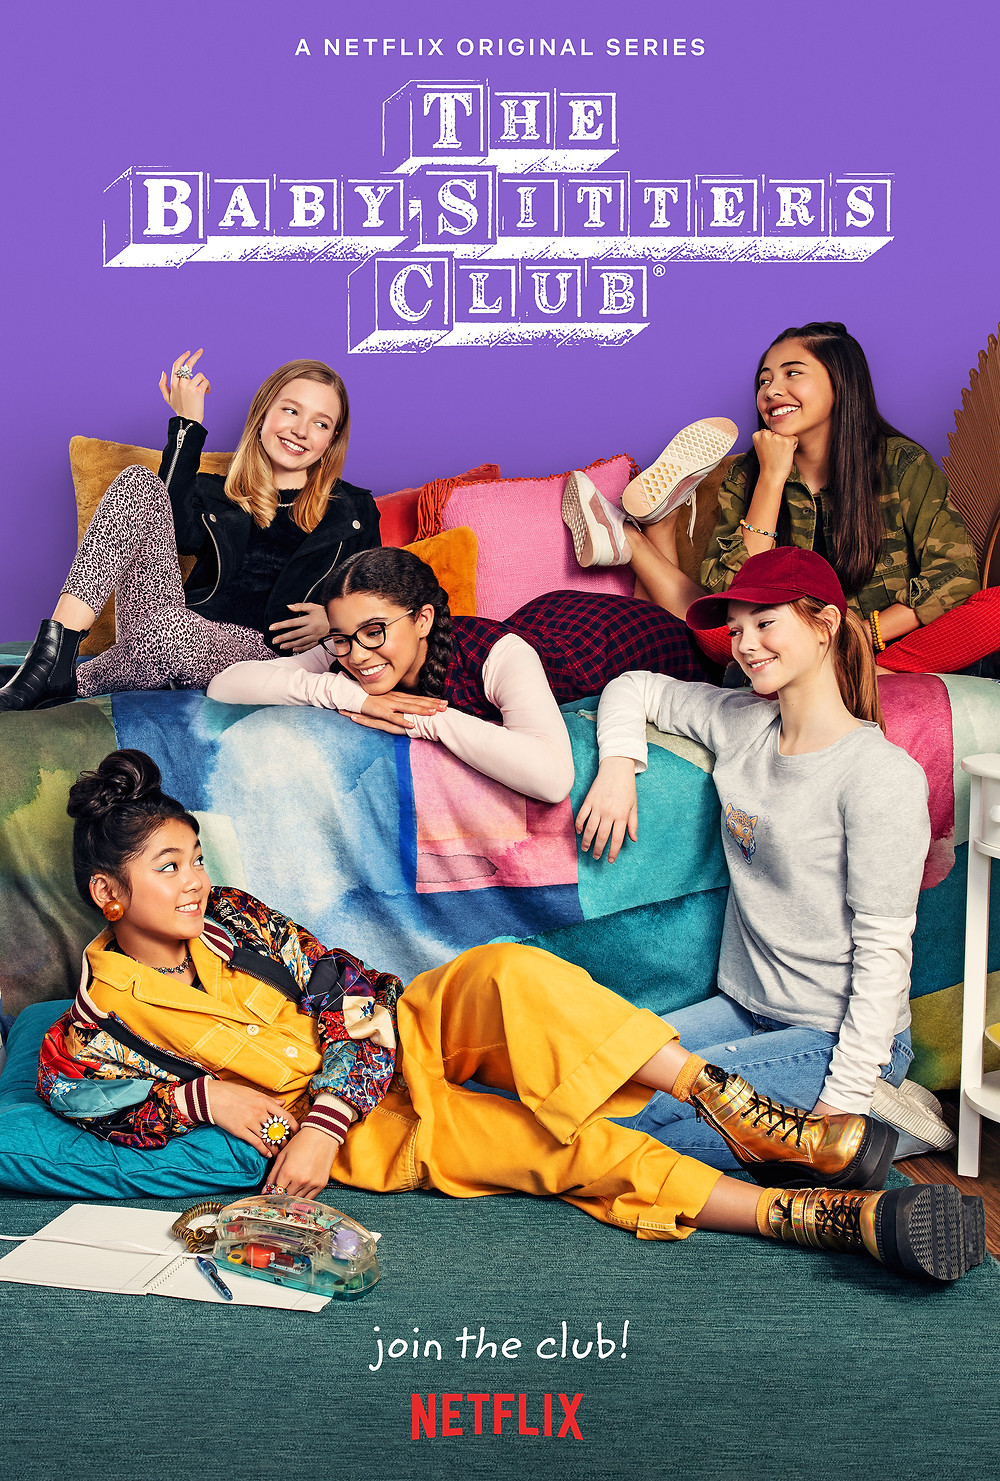 The Babysitters Club (2020 Netflix reboot)